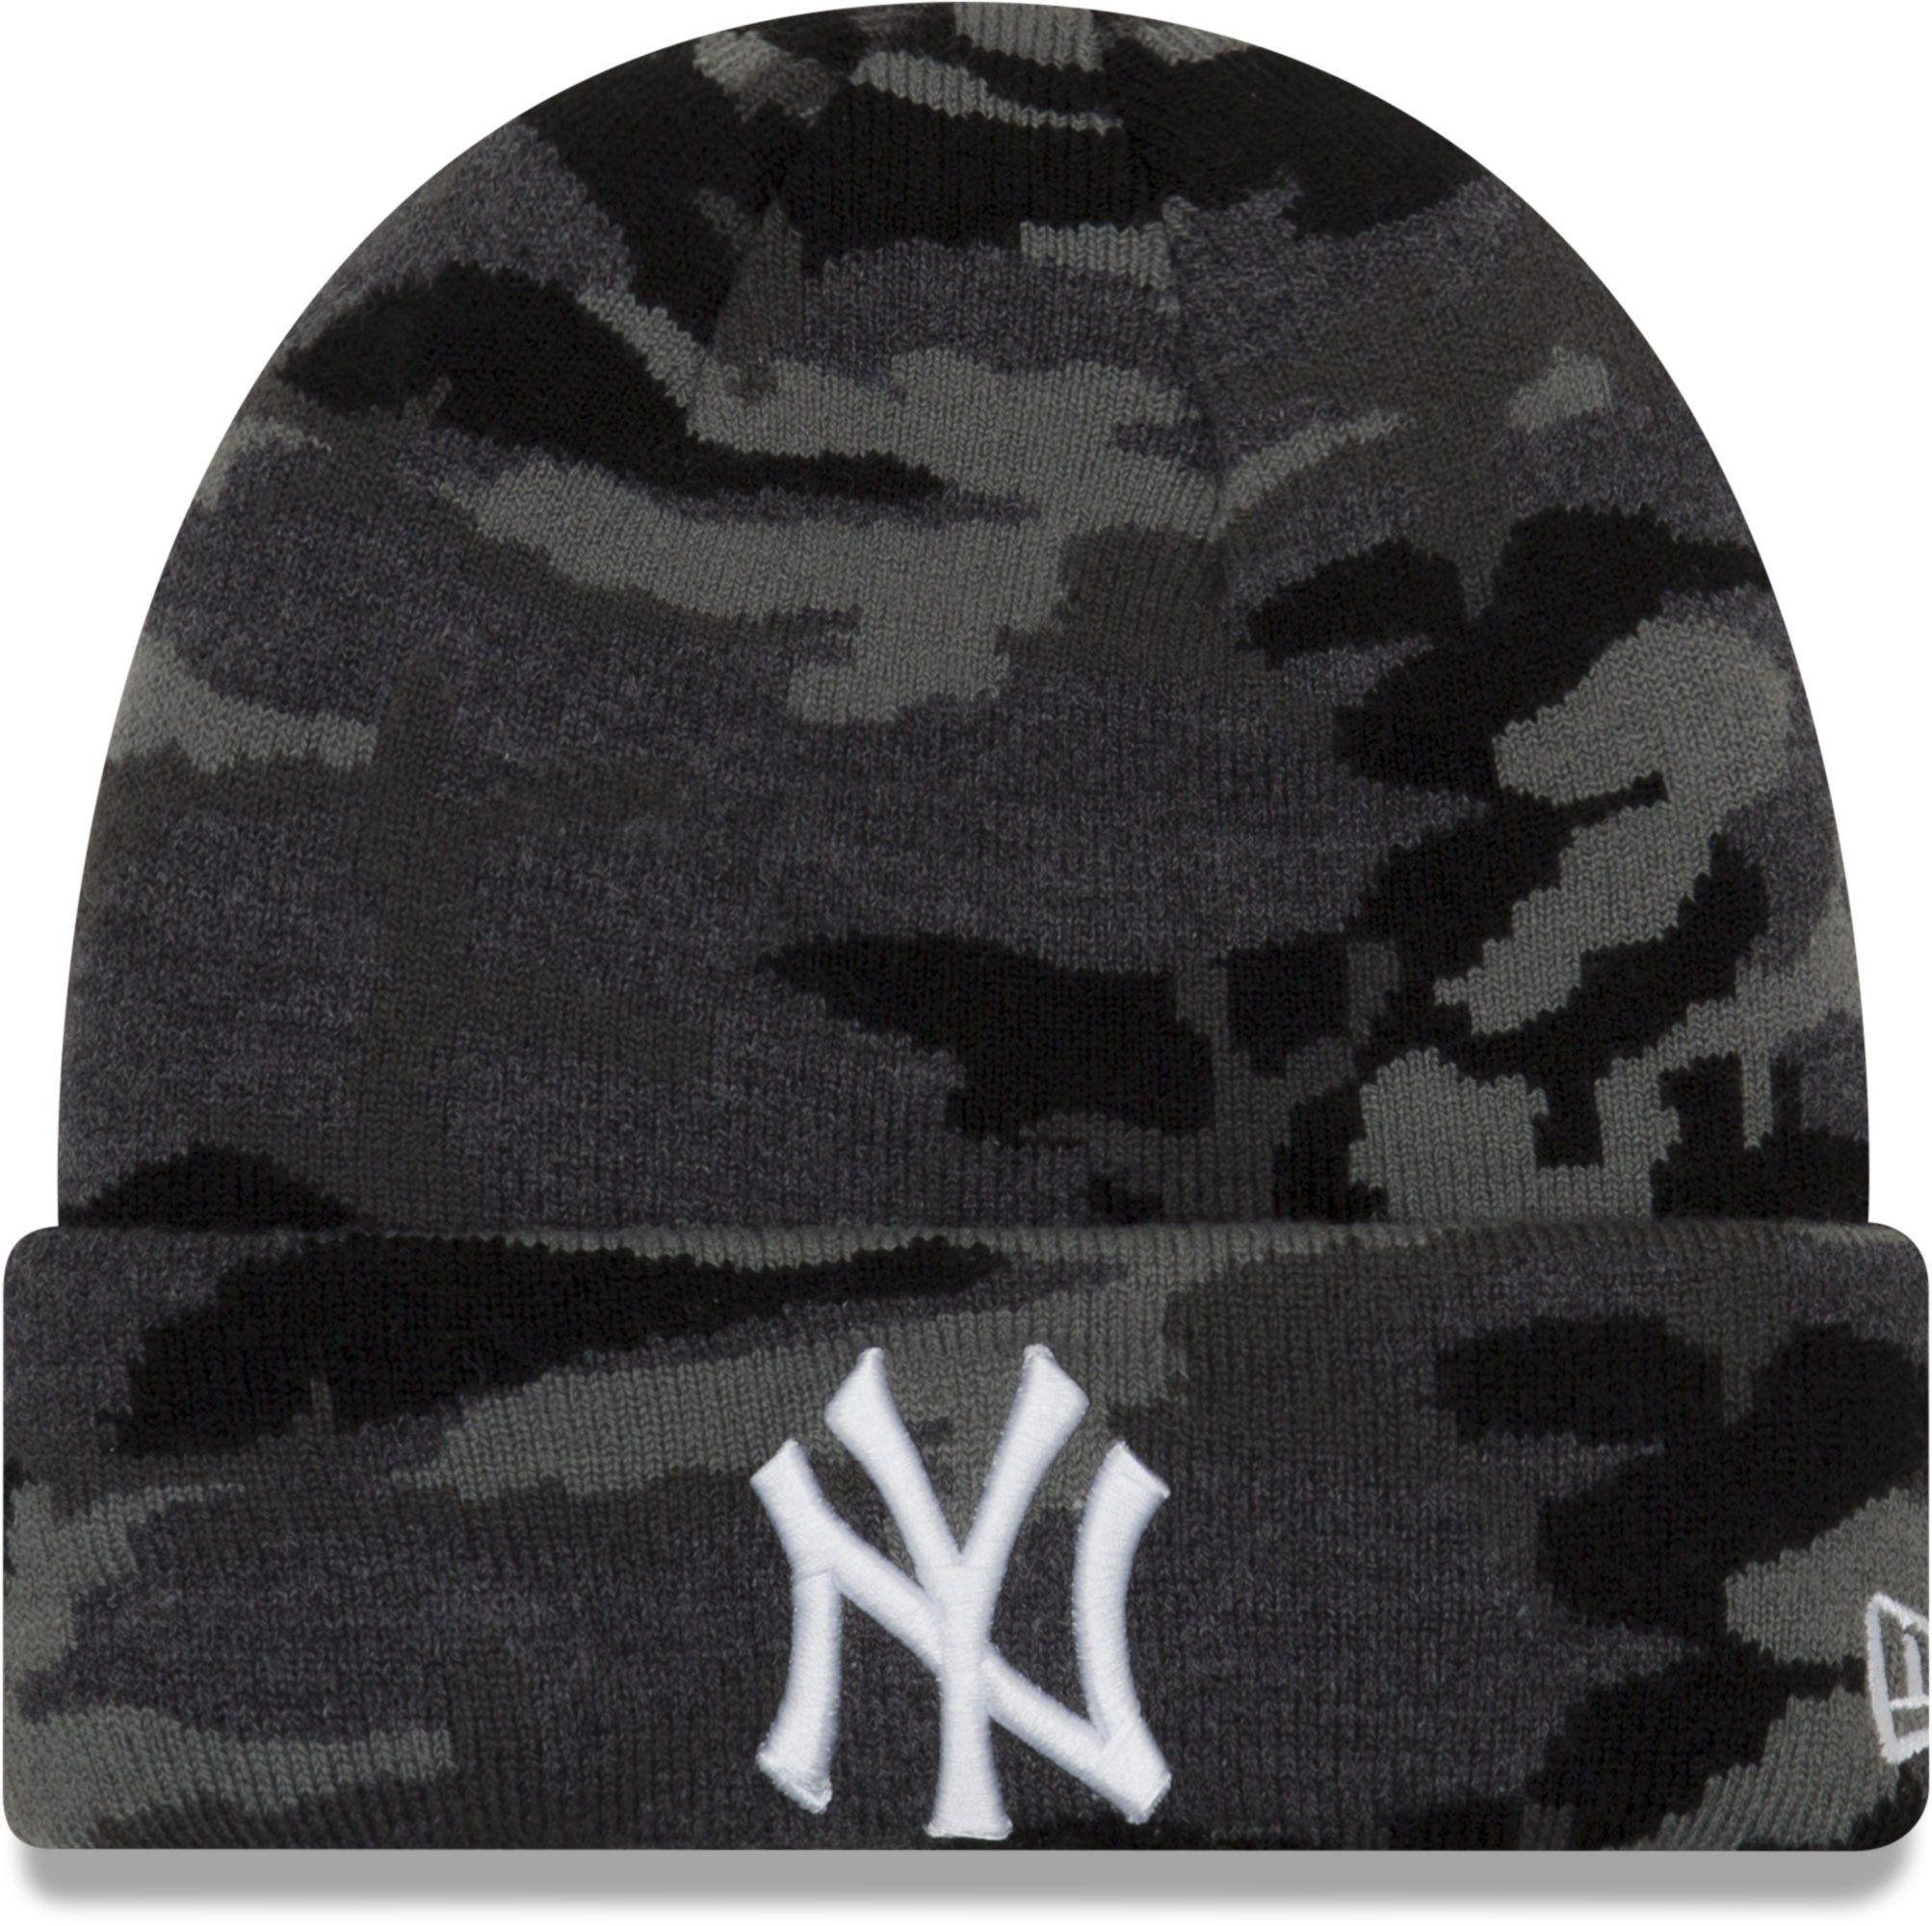 New York Yankees New Era Essential Midnight Camo Knit Beanie Lovemycap Camo Kids Kids Beanies New Era Kids